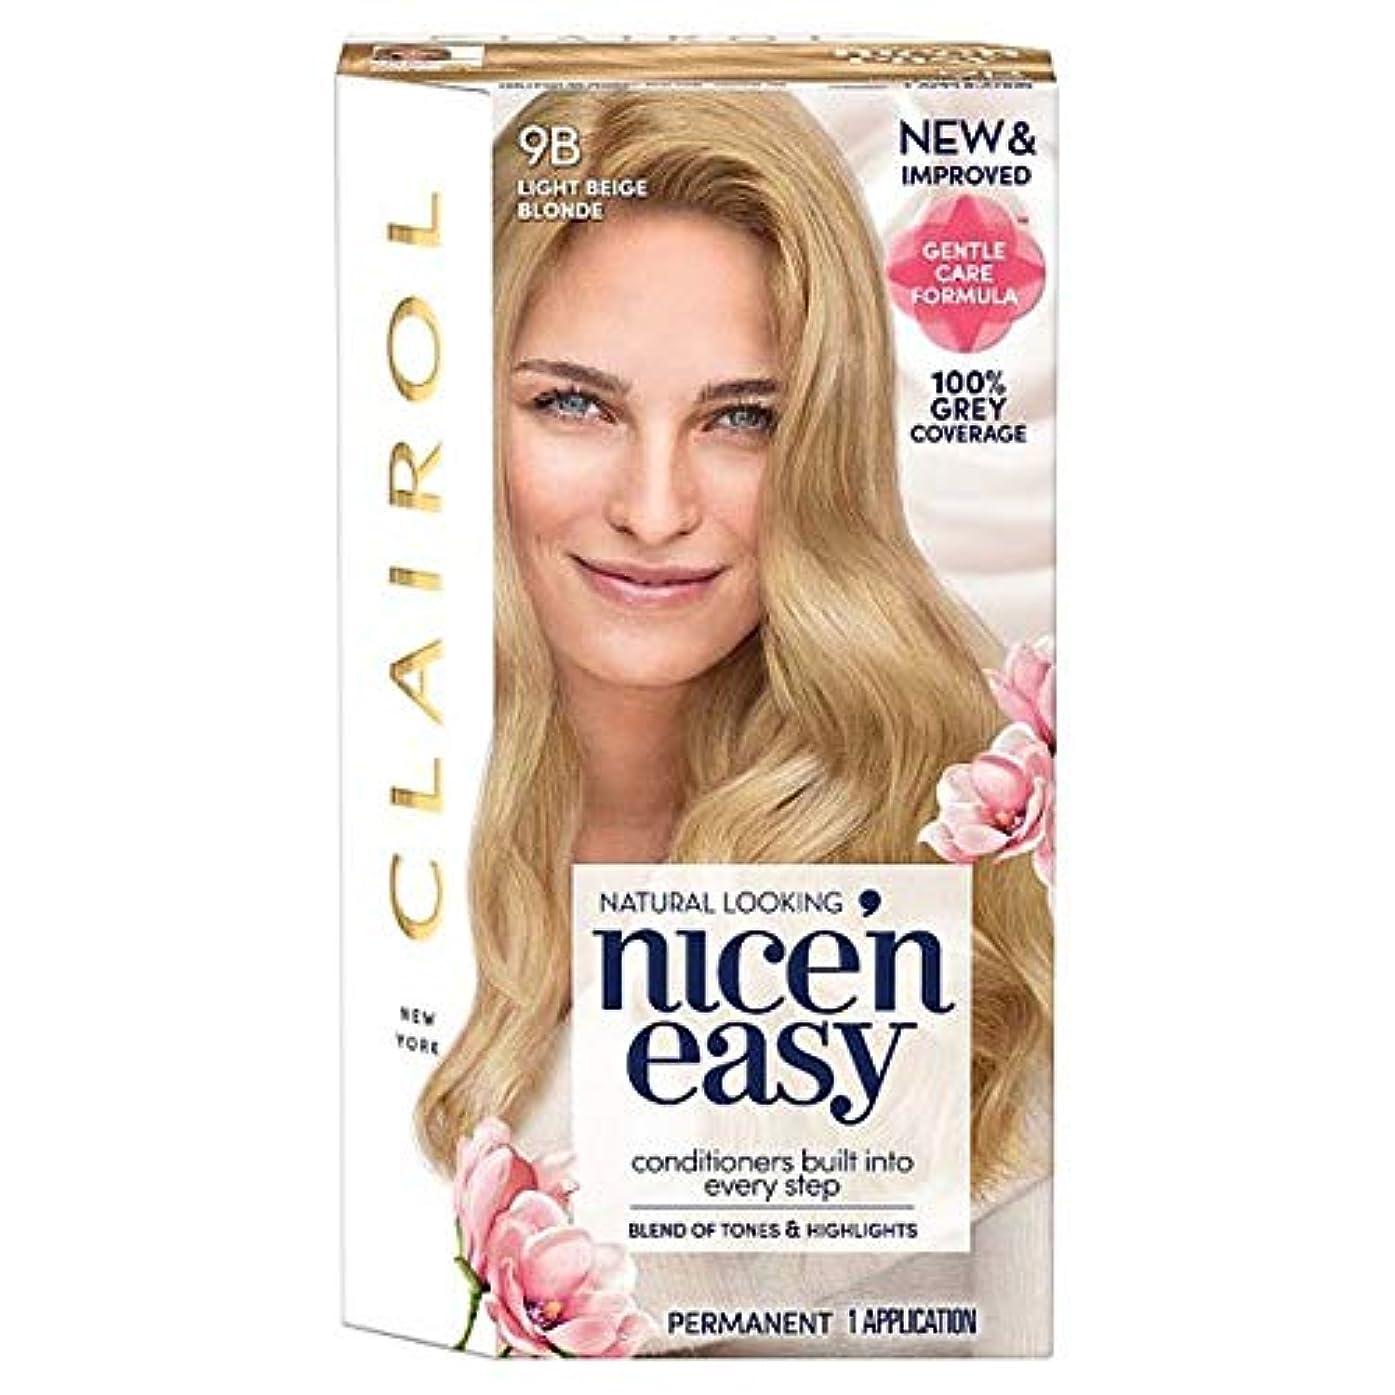 [Nice'n Easy] クレイロール素敵な「N簡単にライトベージュブロンド9Bの染毛剤 - Clairol Nice 'N Easy Light Beige Blonde 9B Hair Dye [並行輸入品]